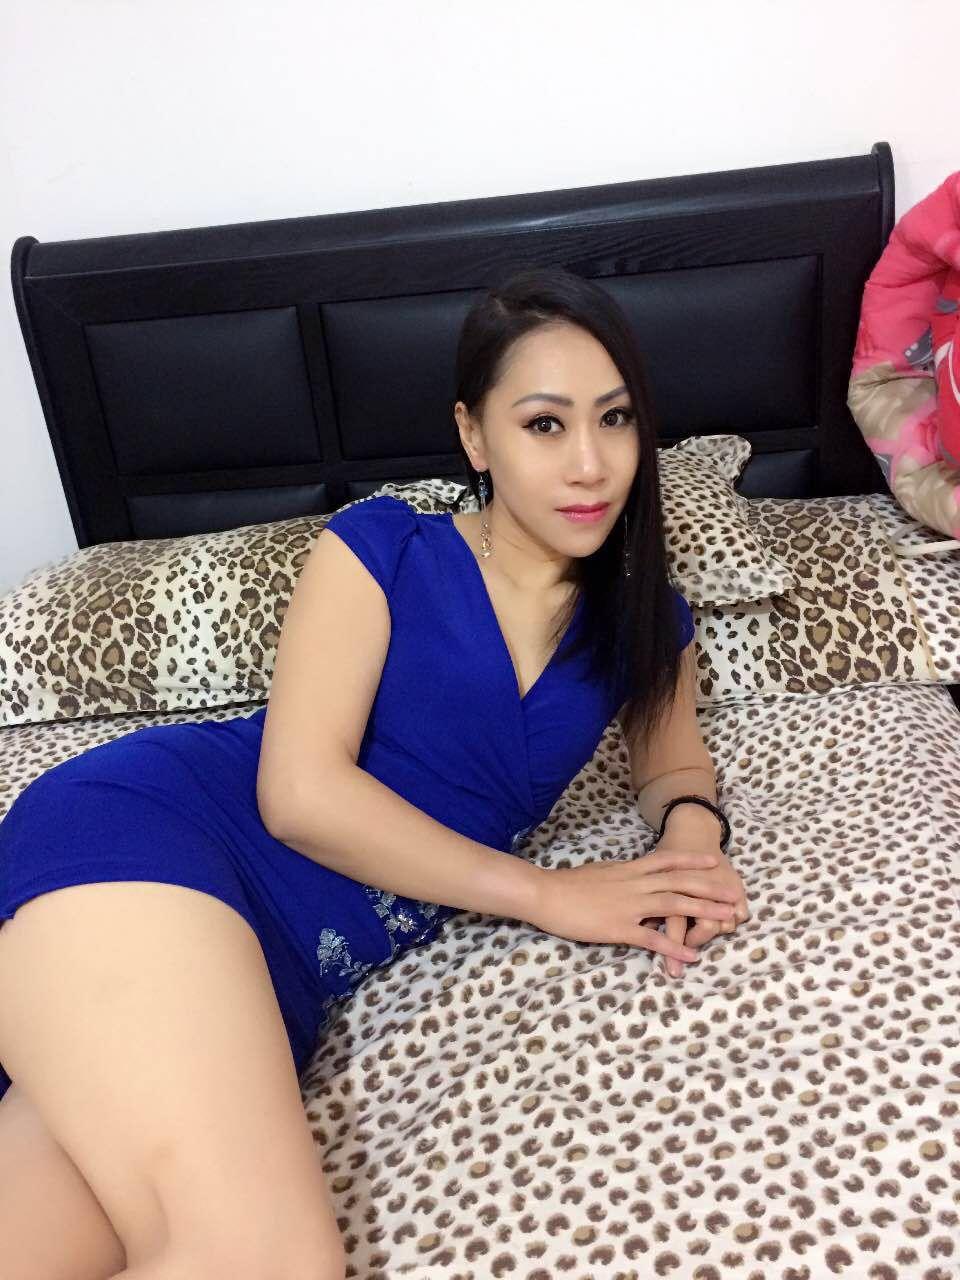 japanese sexy massage escort piger jylland